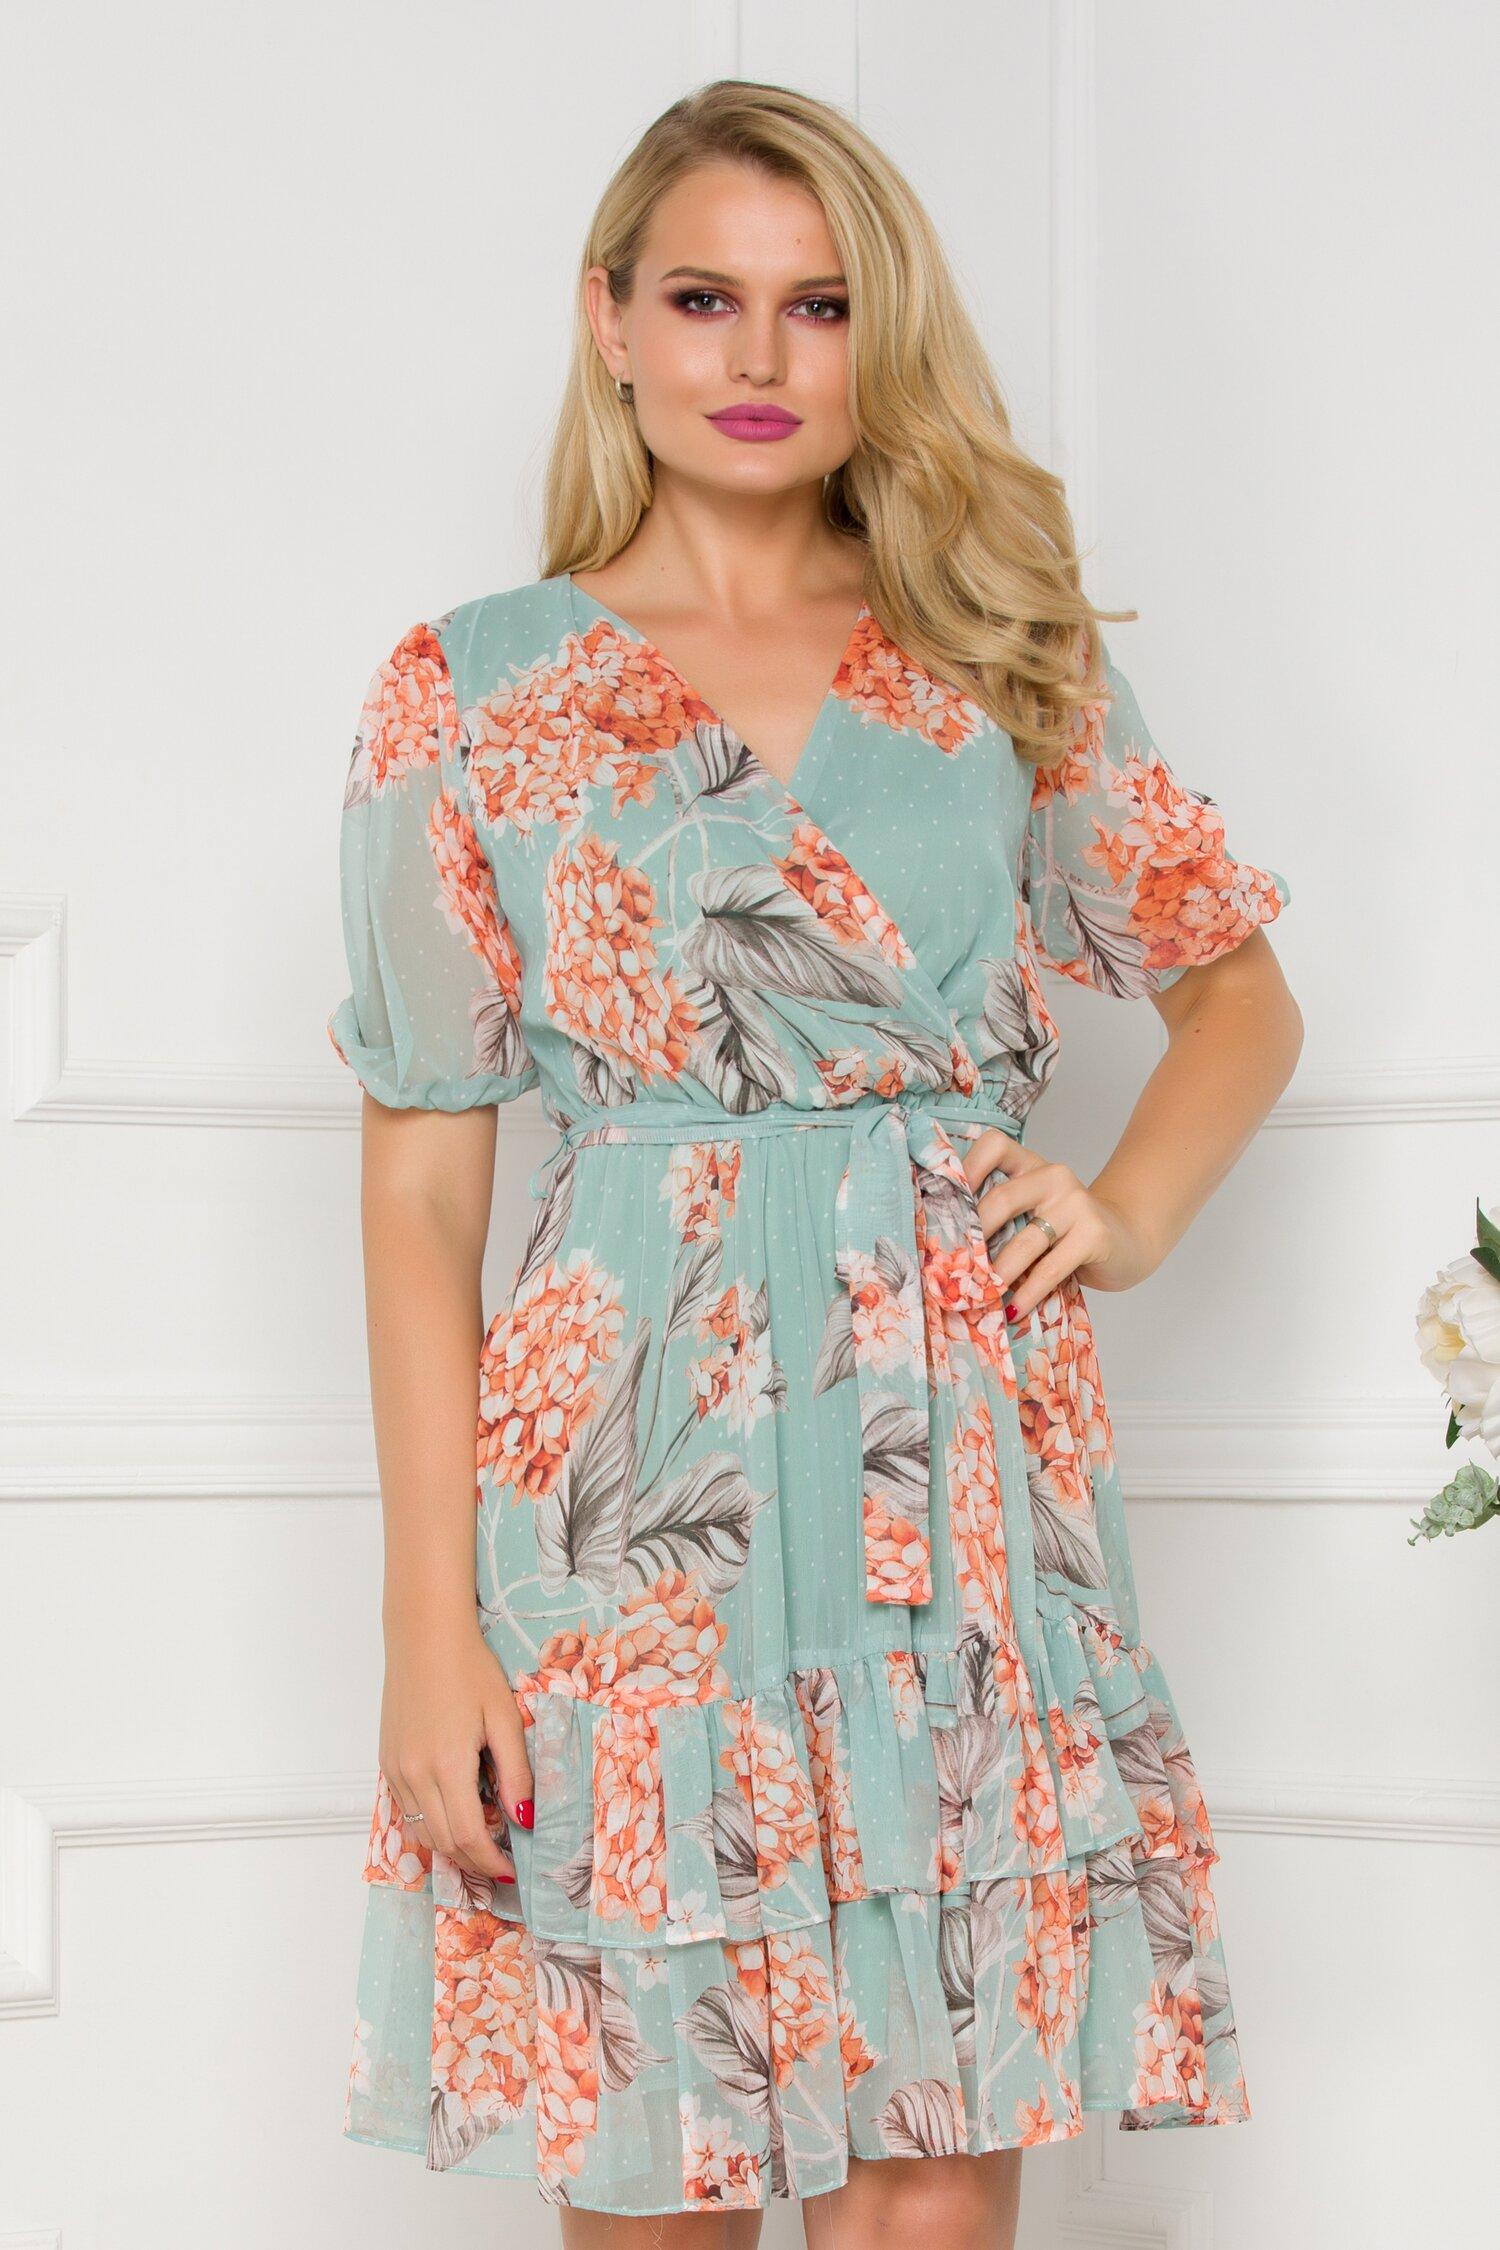 Rochie Anisia verde mint cu imprimeuri florale orange